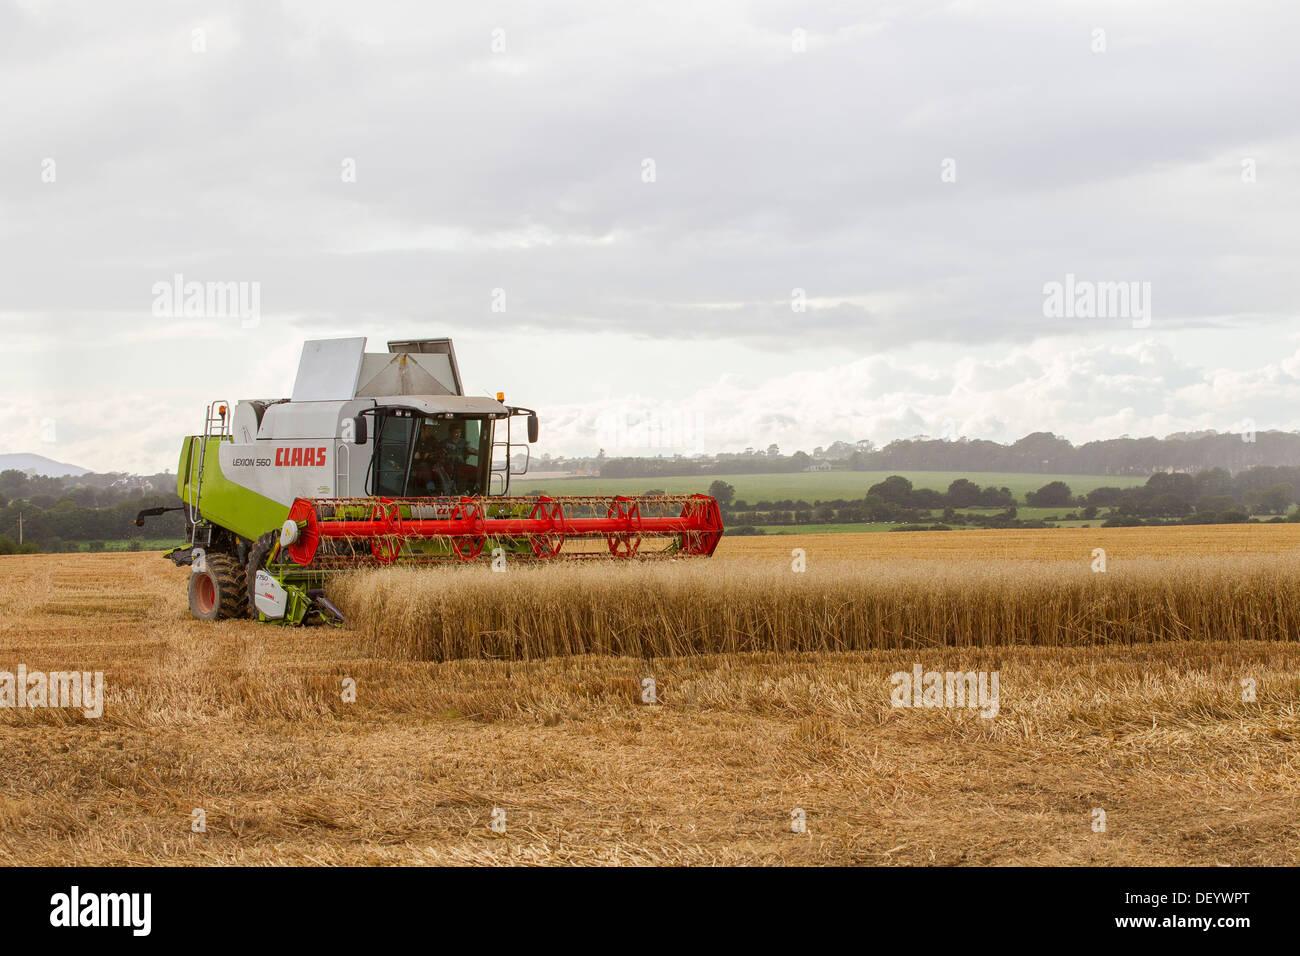 combine harvester harvesting wheat crop field uk - Stock Image